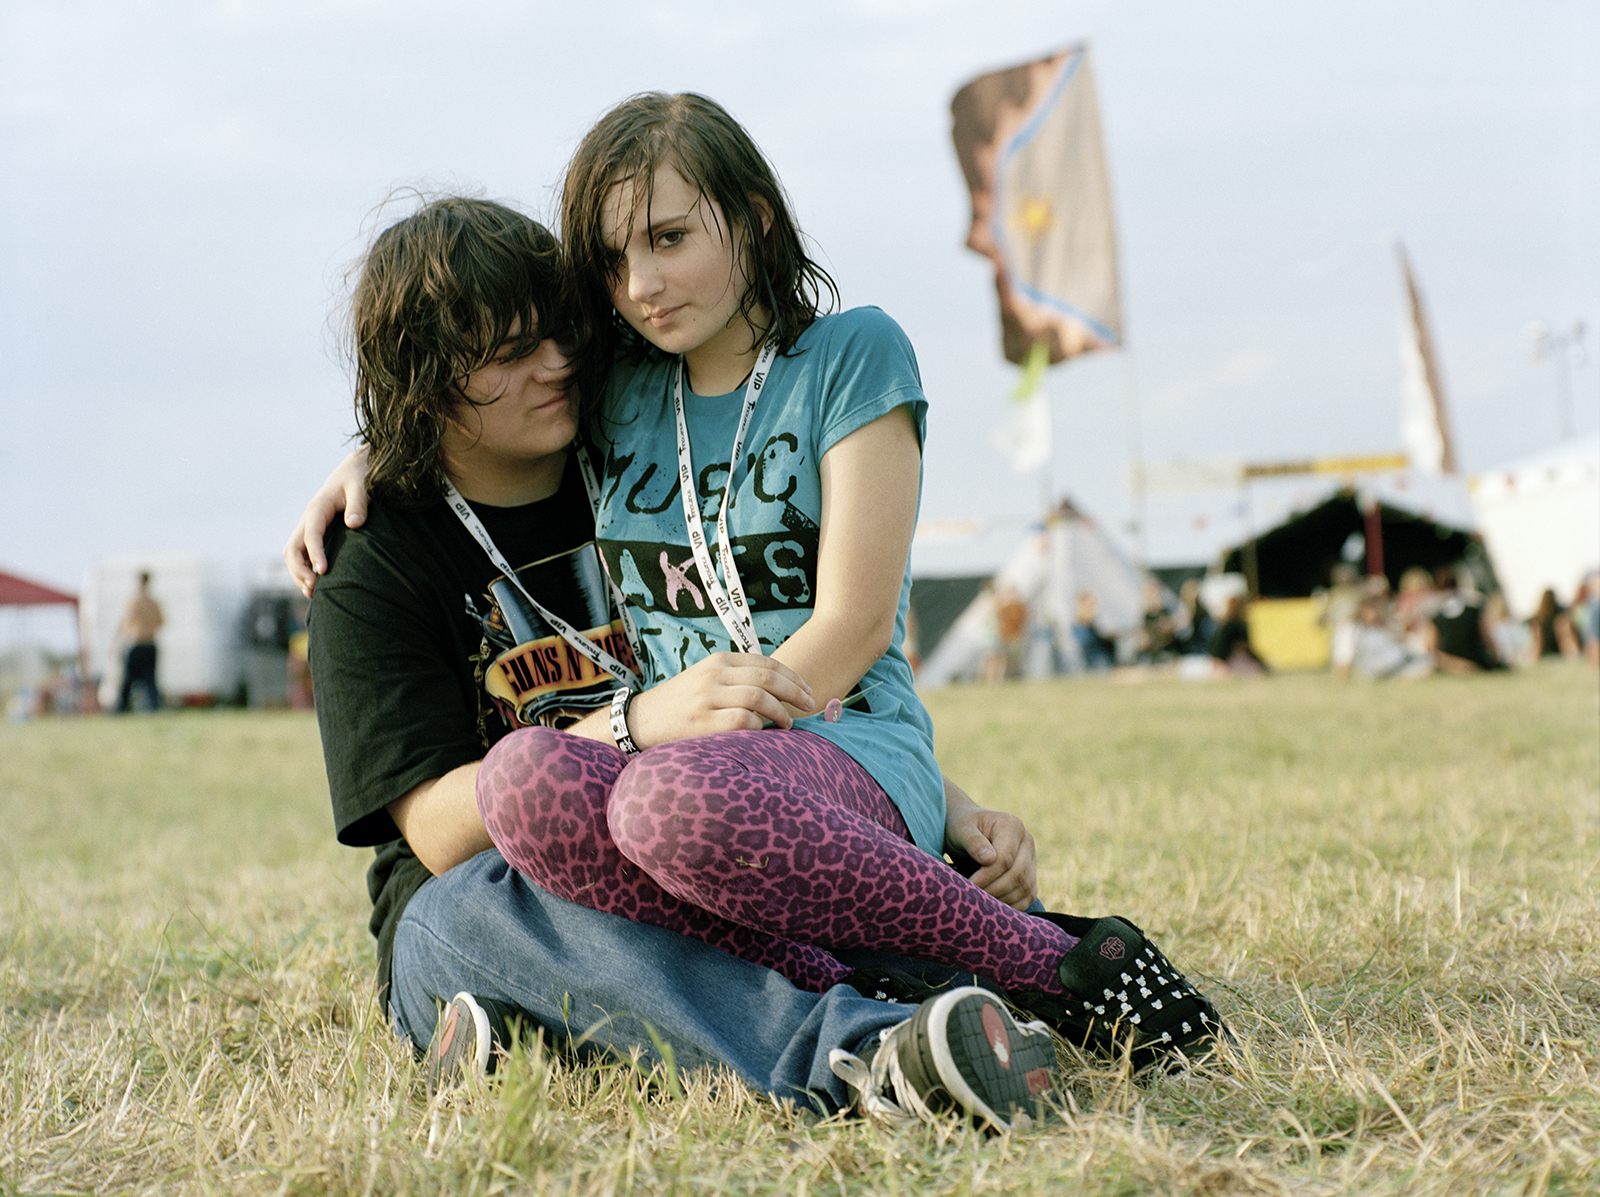 couplesuff+1rtdesatcrop.jpg